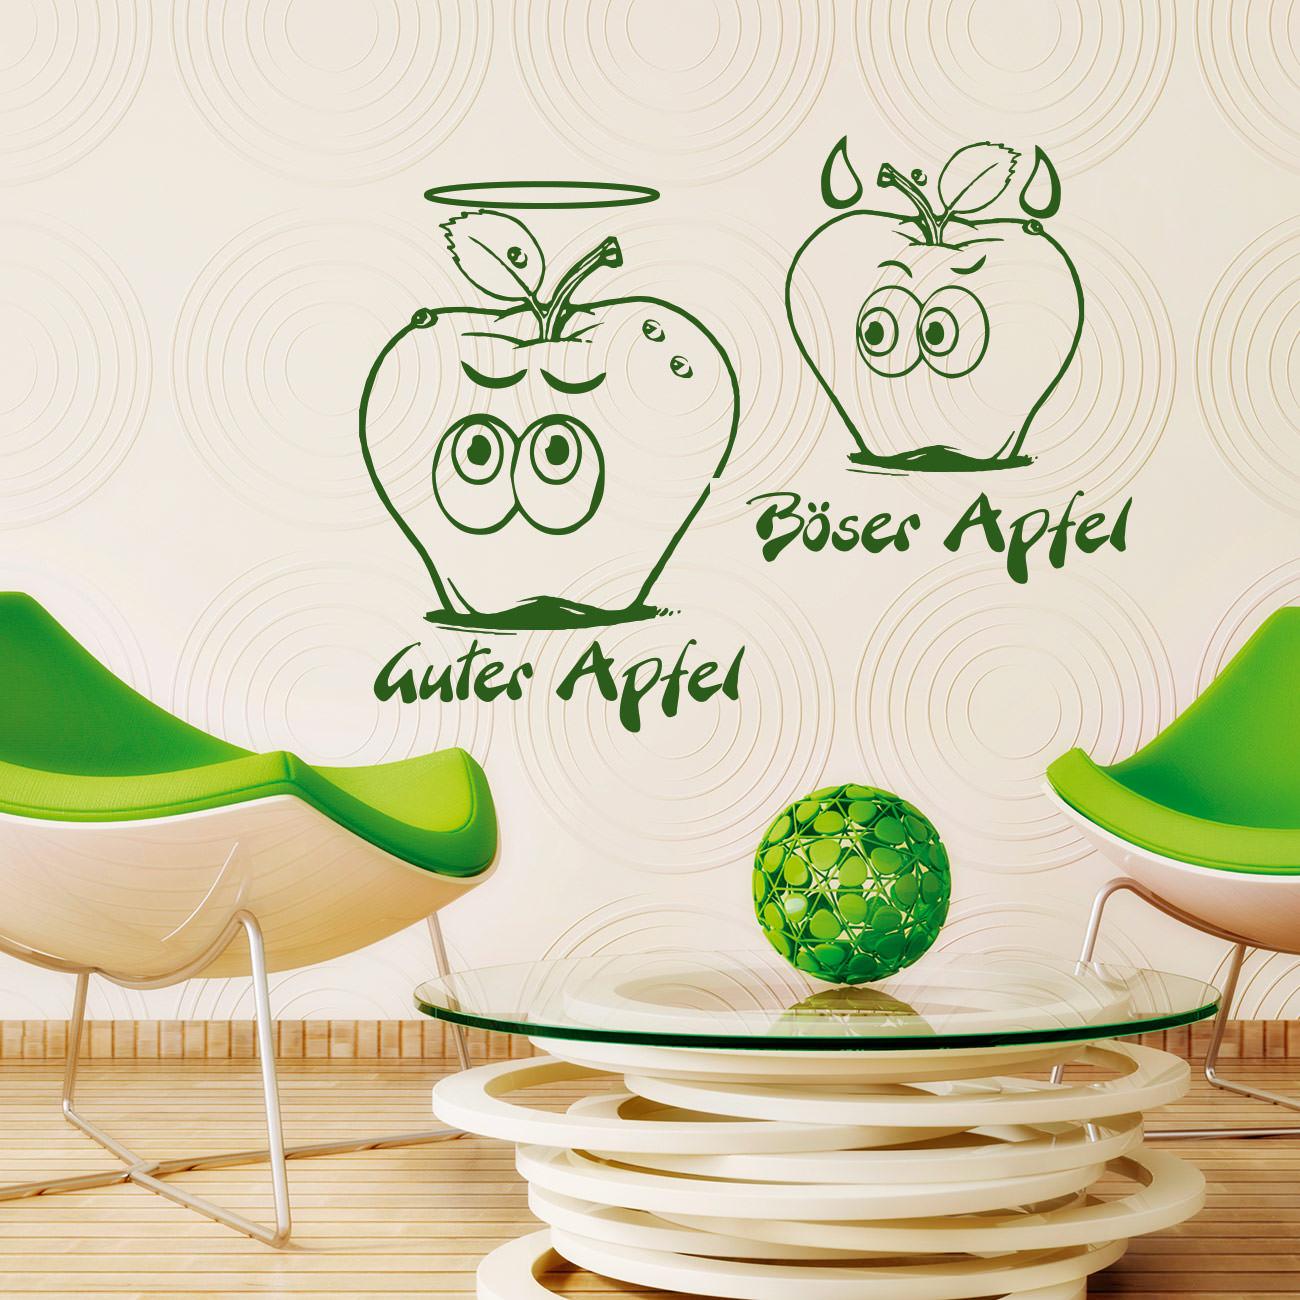 Guter Apfel Böser Apfel bad apple good Wandtattoo